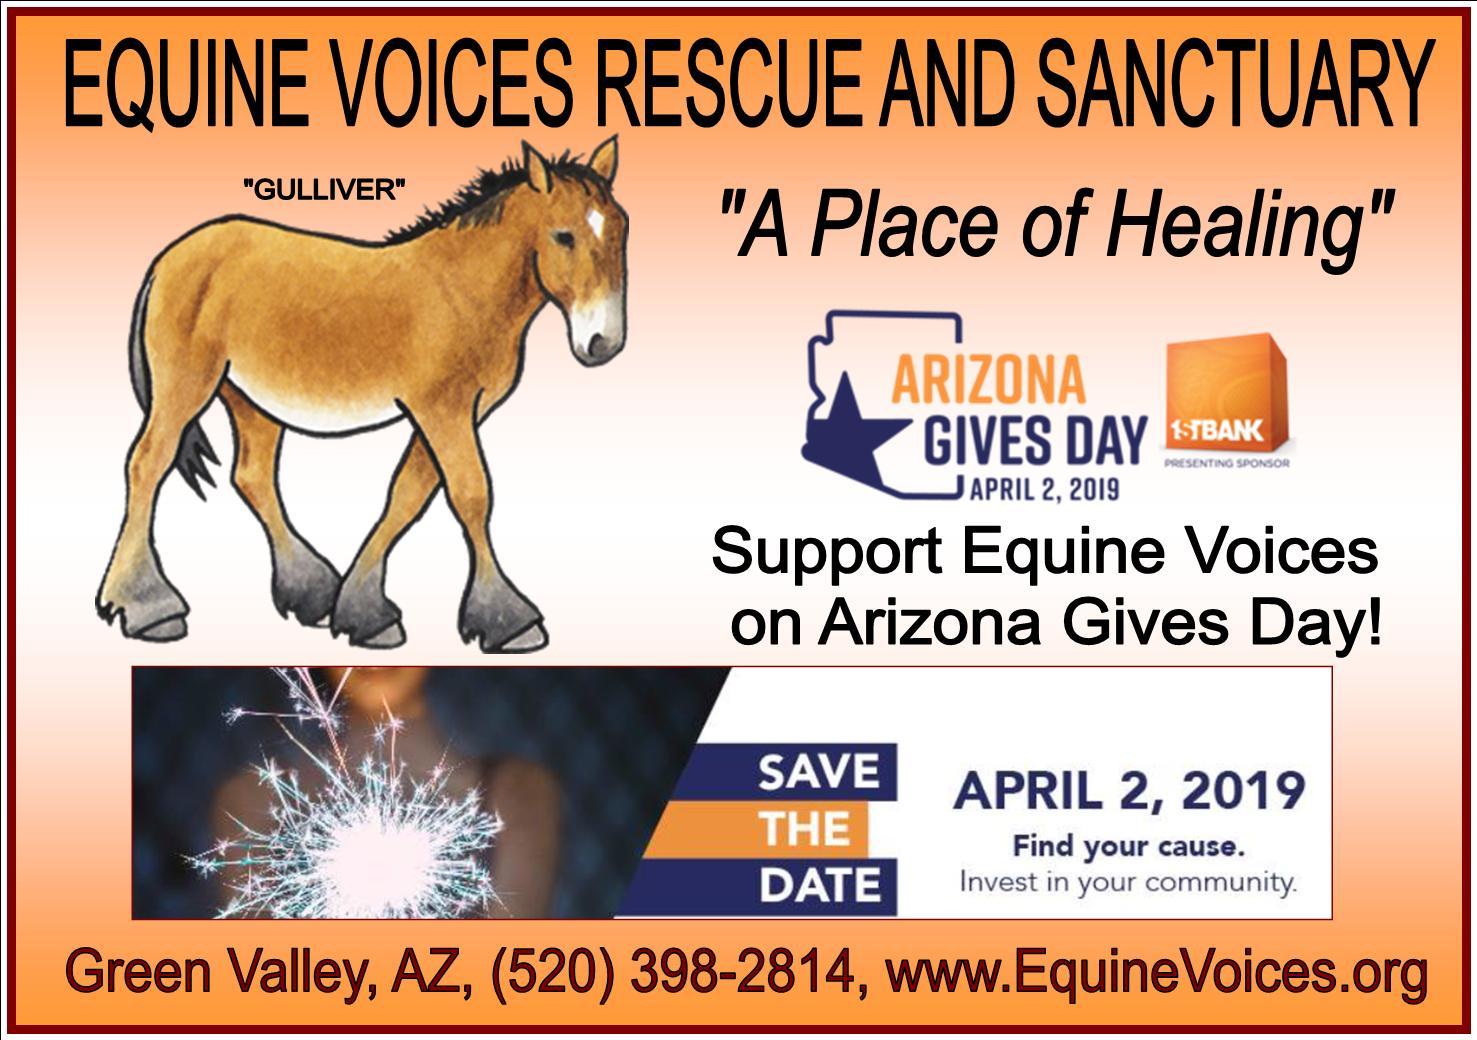 http://campaign-image.com/zohocampaigns/276712000005988004_zc_v42_equine_voices_az_gives_day_2019_(1).jpg